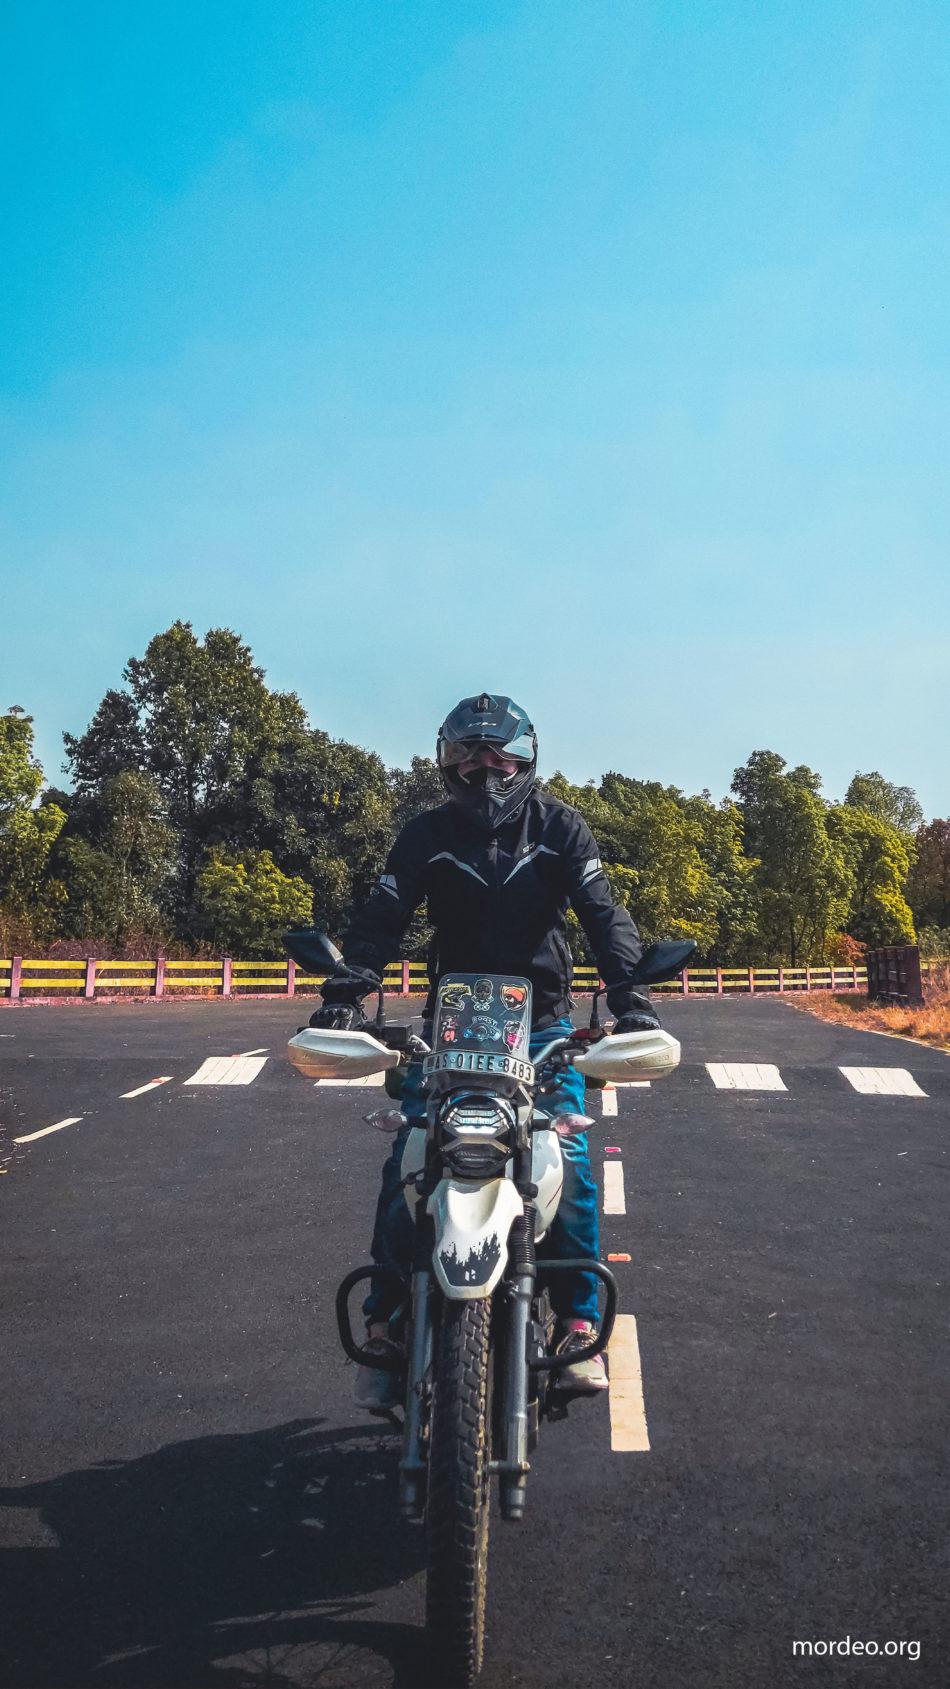 Hero Xpulse Rider Traveler 4K Ultra HD Mobile Wallpaper